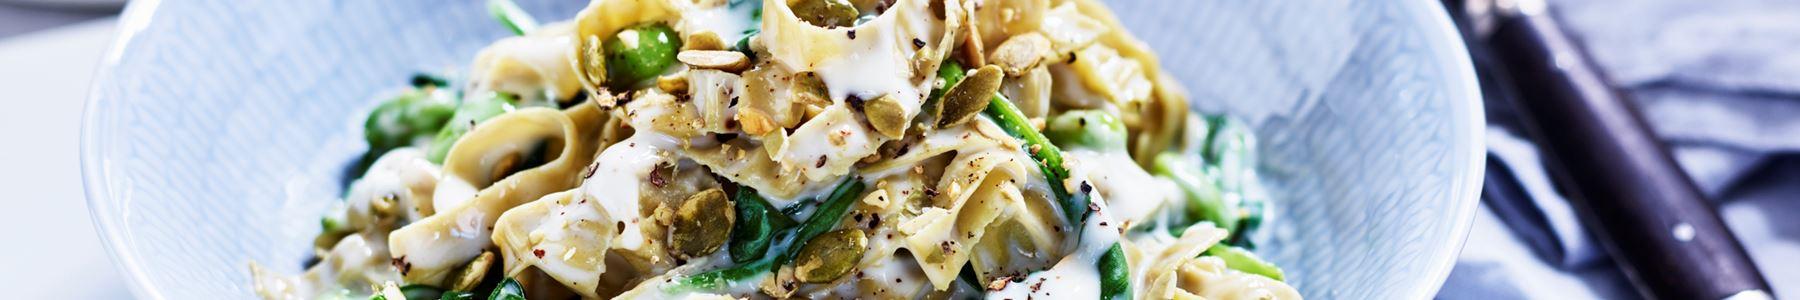 Snabb + Kalorisnål + Spenat + Pasta + Matsedel